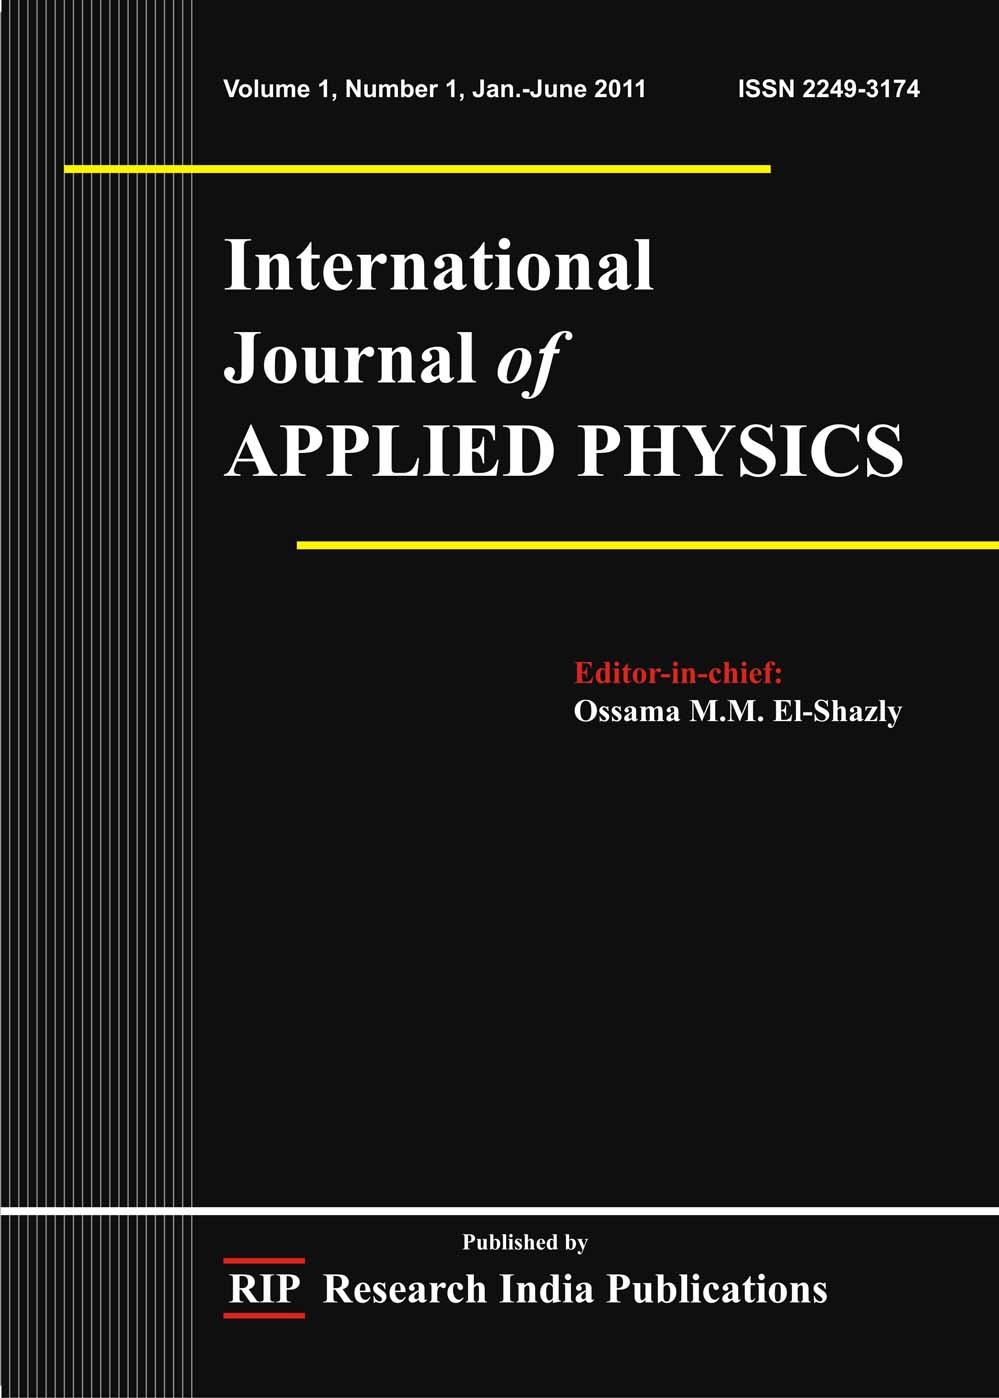 IJAP, International Journal of Applied Physics, Computer